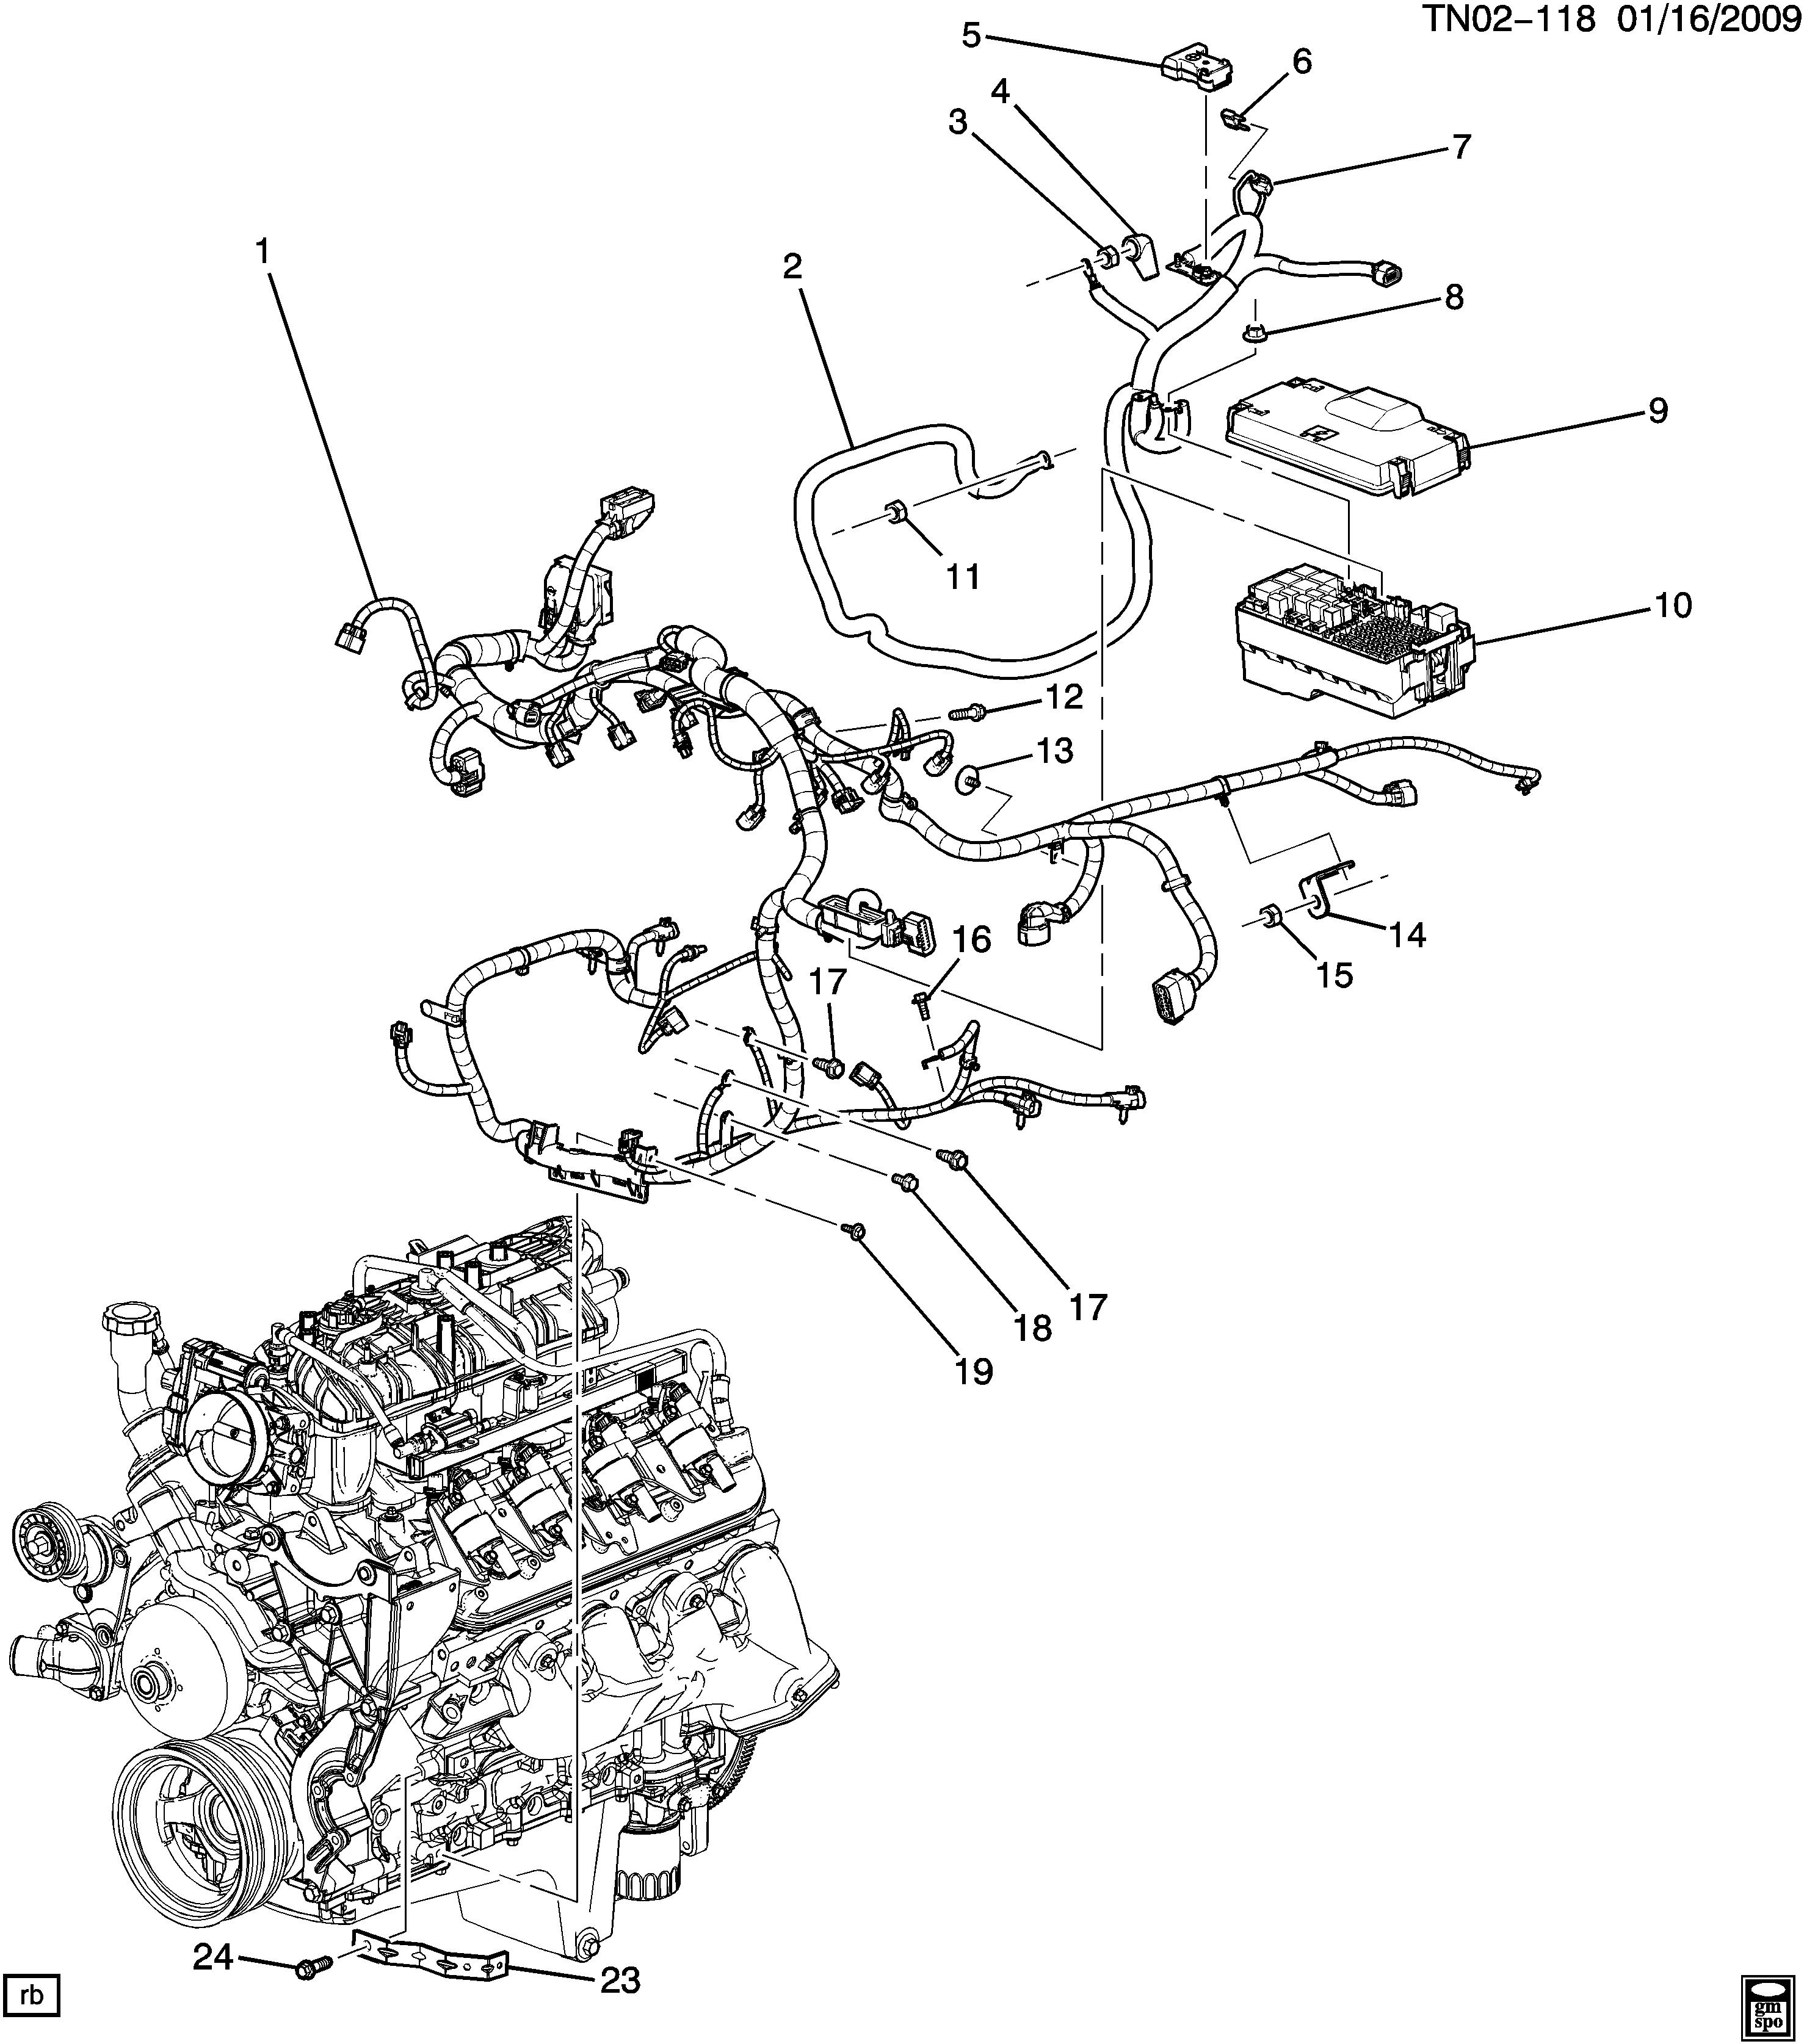 hummer h3 / spare parts catalog epc